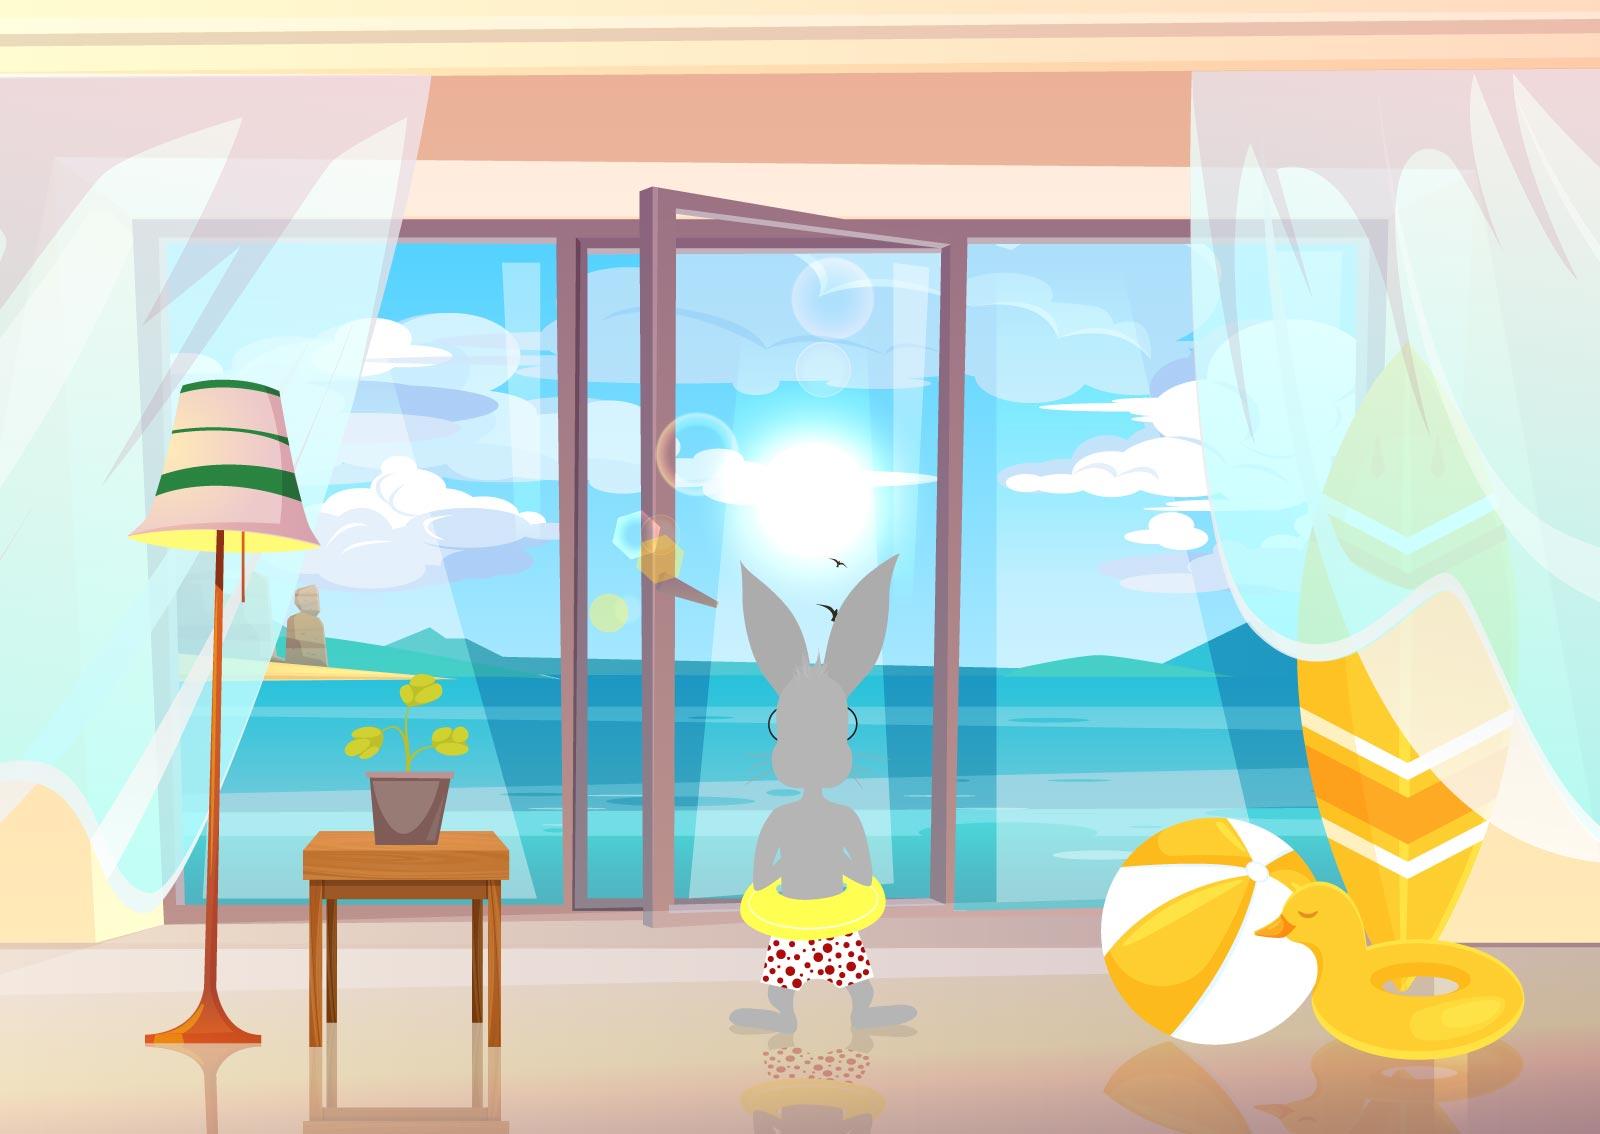 Zaštitni znak web servisa naKlik, sivi zec na letovanju gleda kroz prozor na more